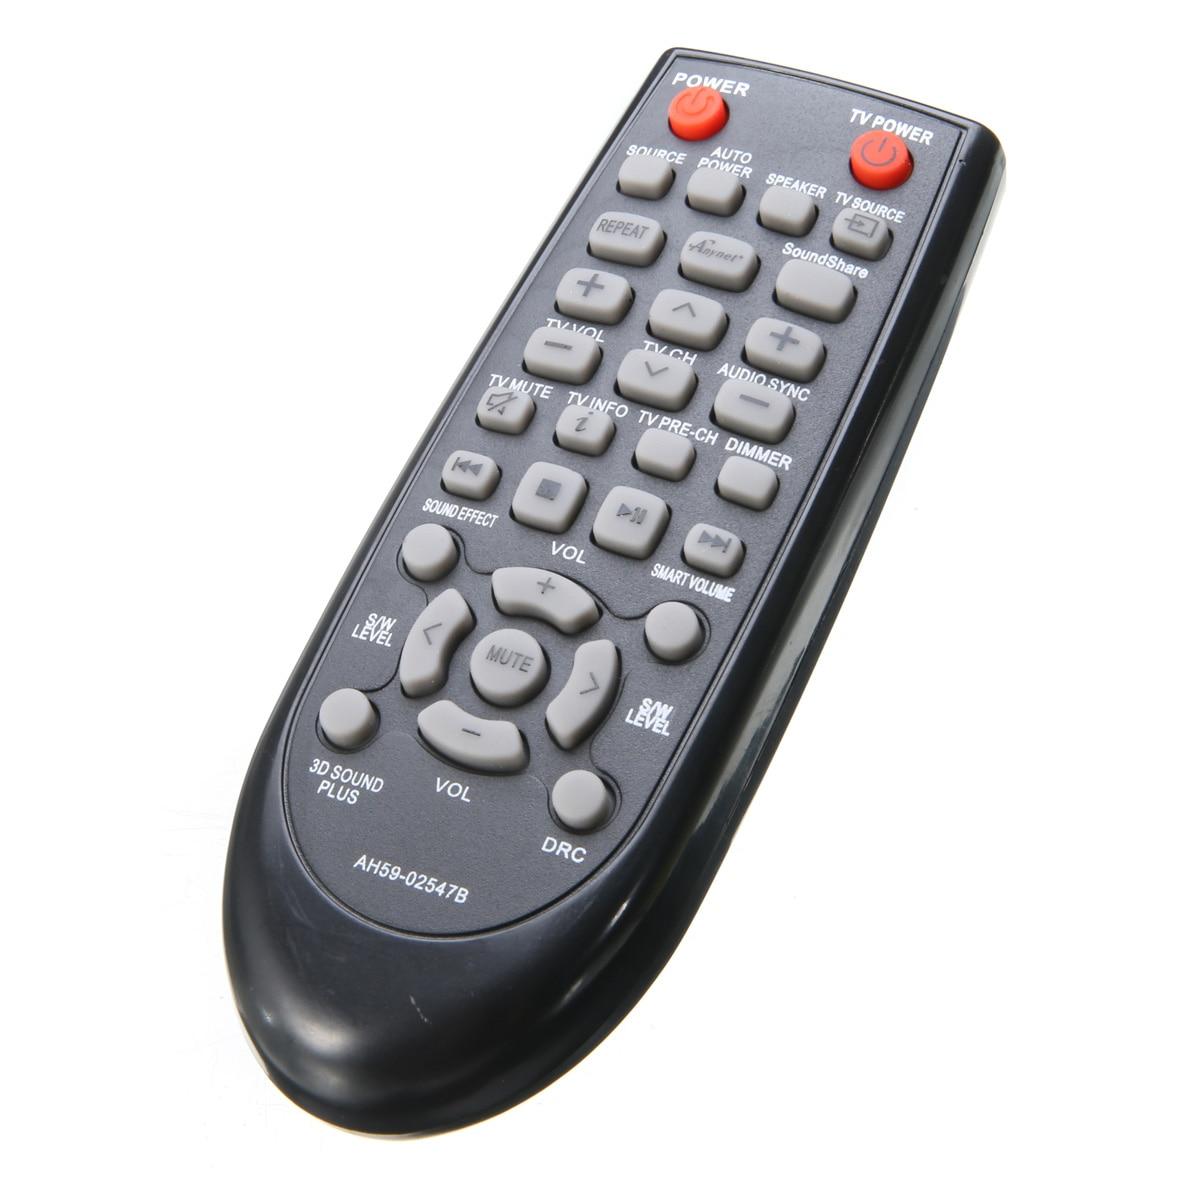 Mayitr AH59-02547B Replacement Remote Control for Samsung Sound Bar HWF450ZA HWF450 PSWF ...